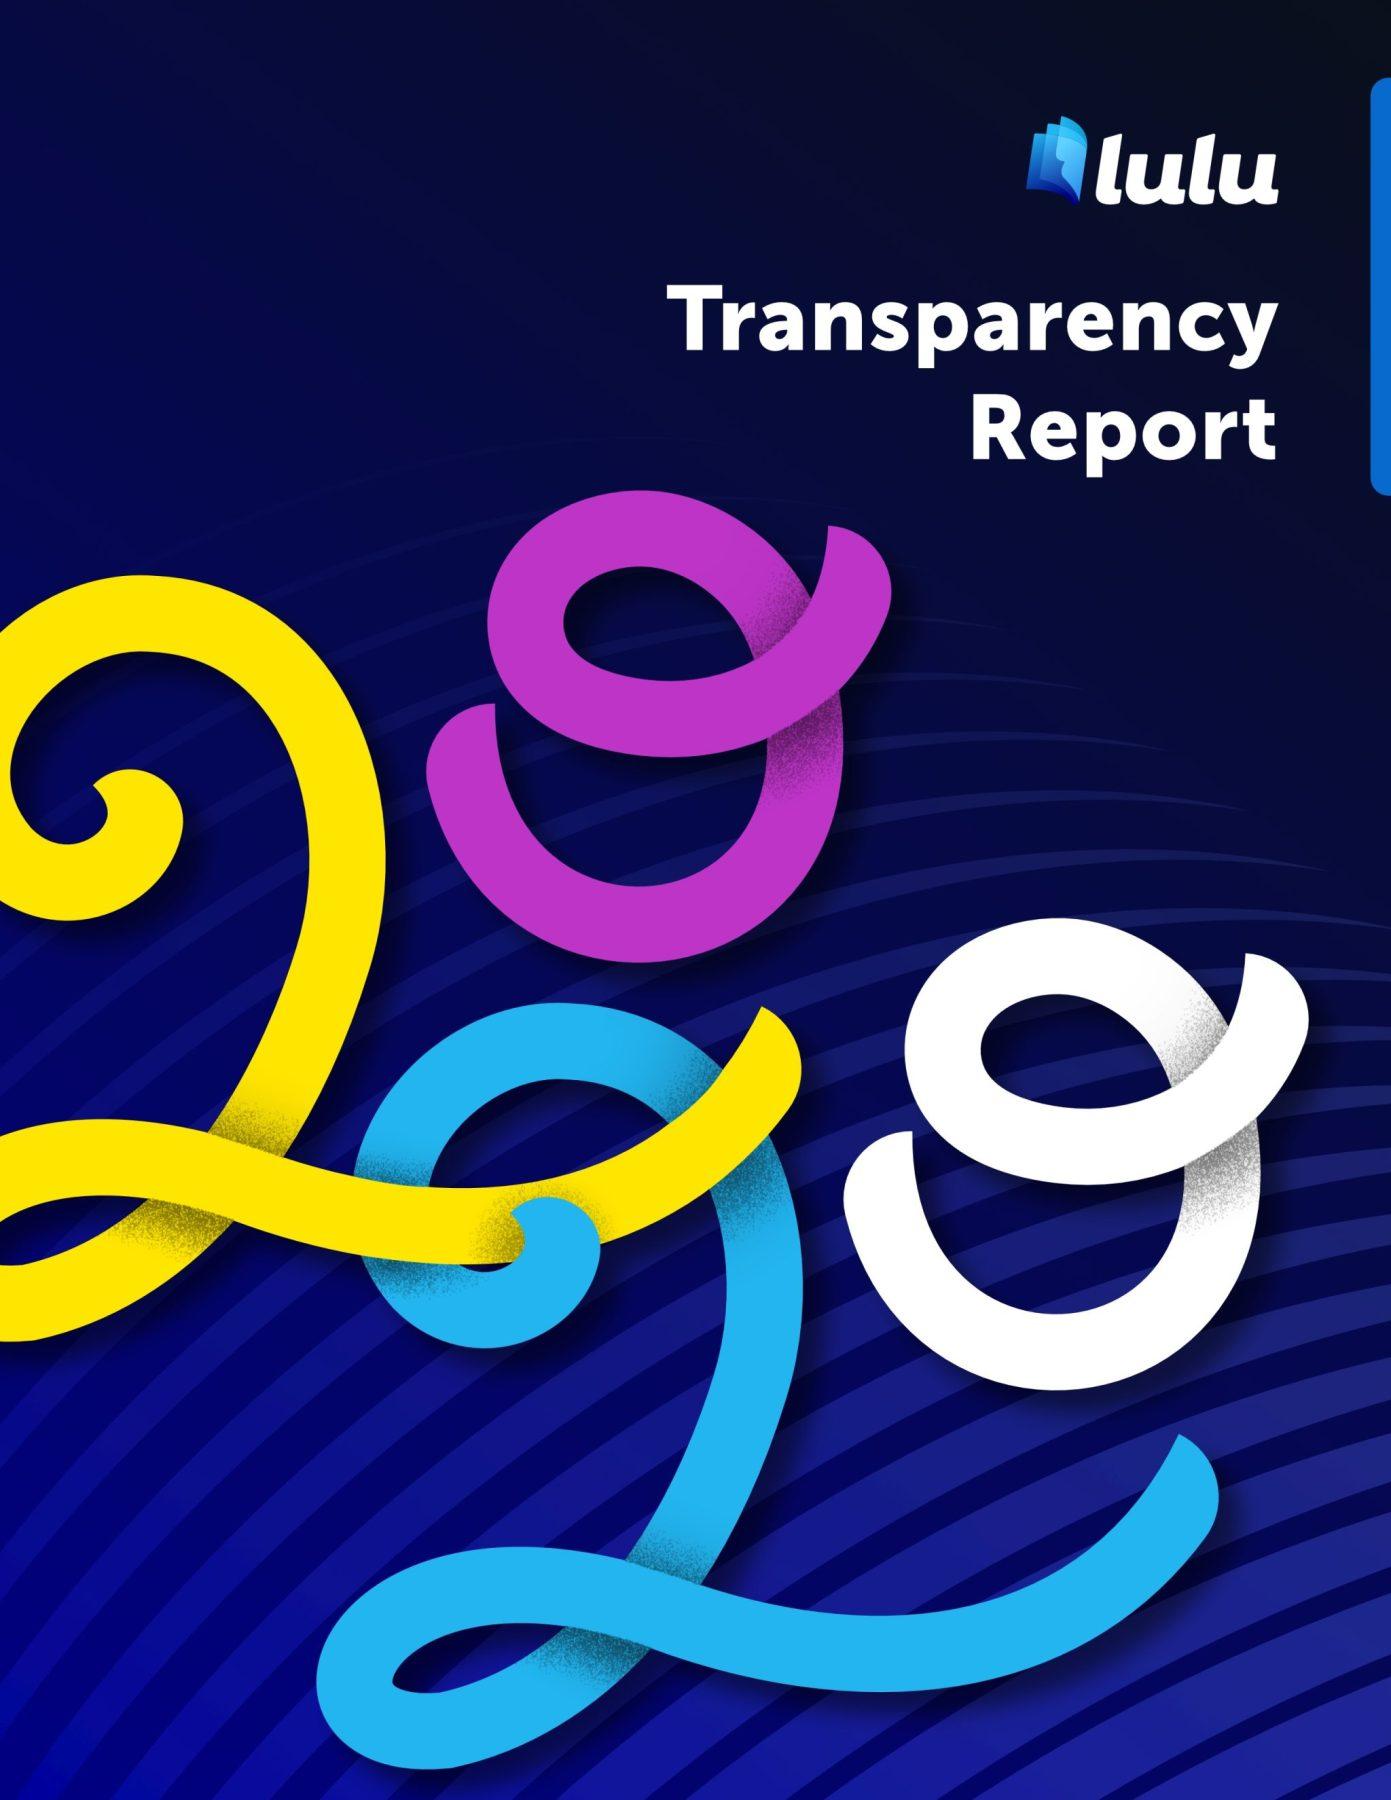 Lulu 2020 transparency report PDF book cover